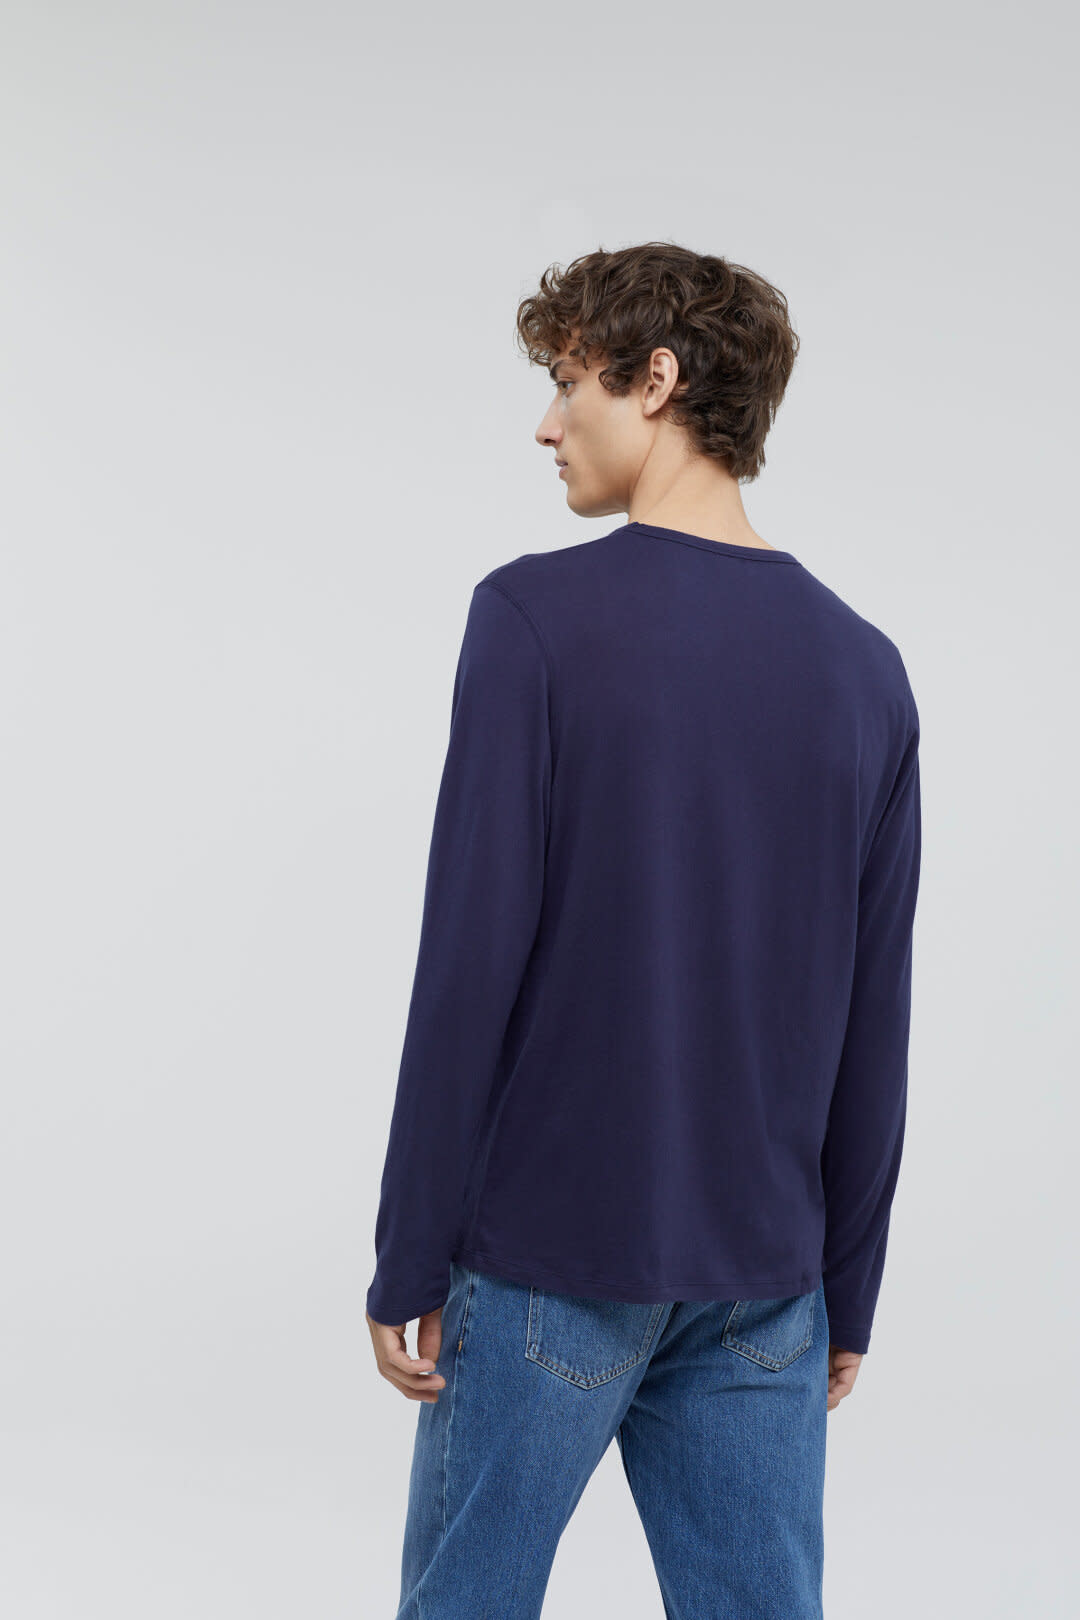 Cotton cashmere longsleeve dark night-2